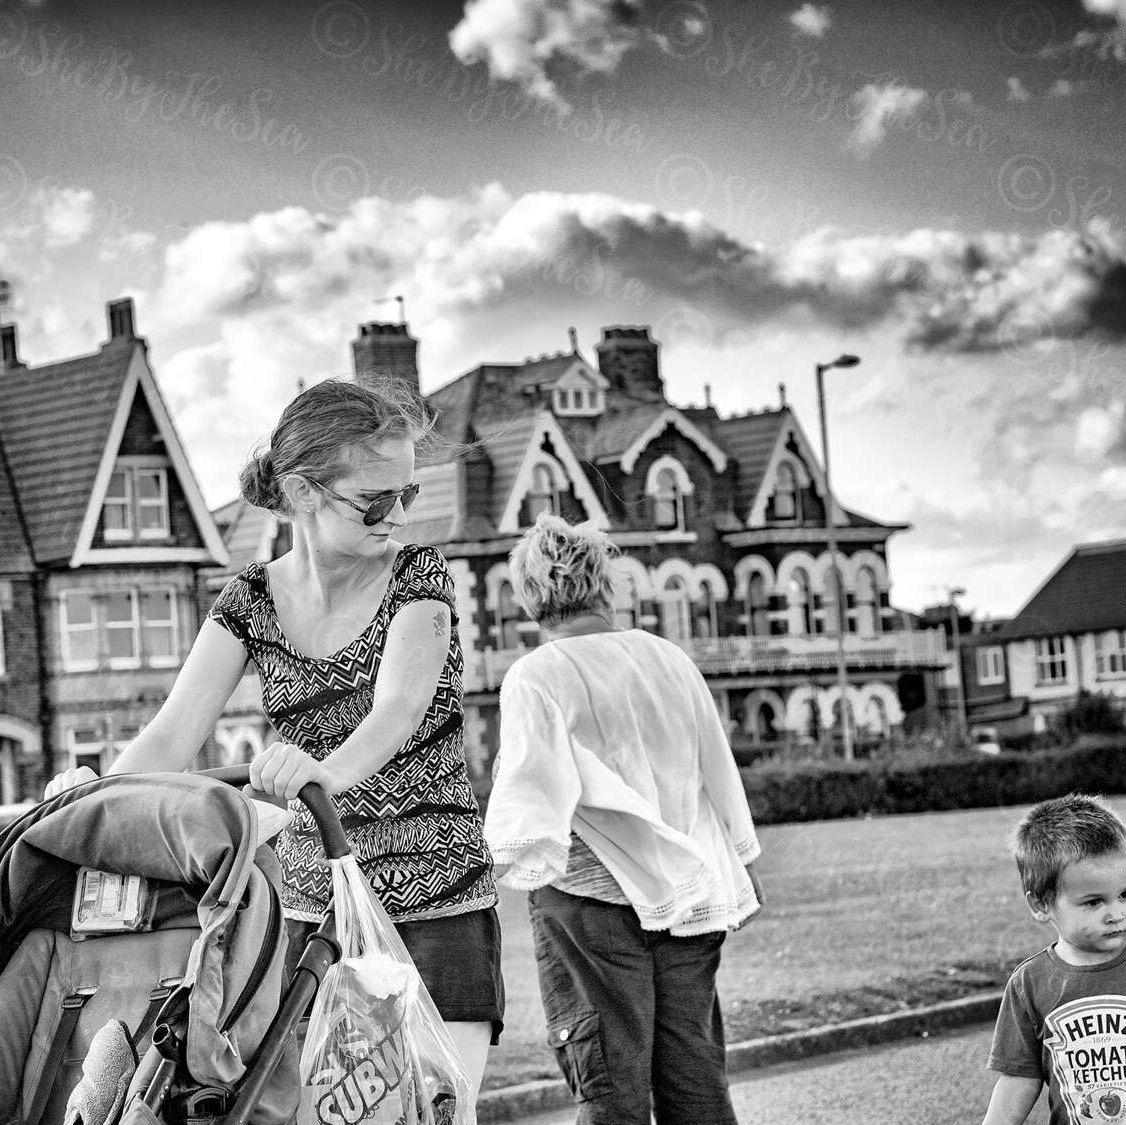 Original photo street urban photography black u white print lady